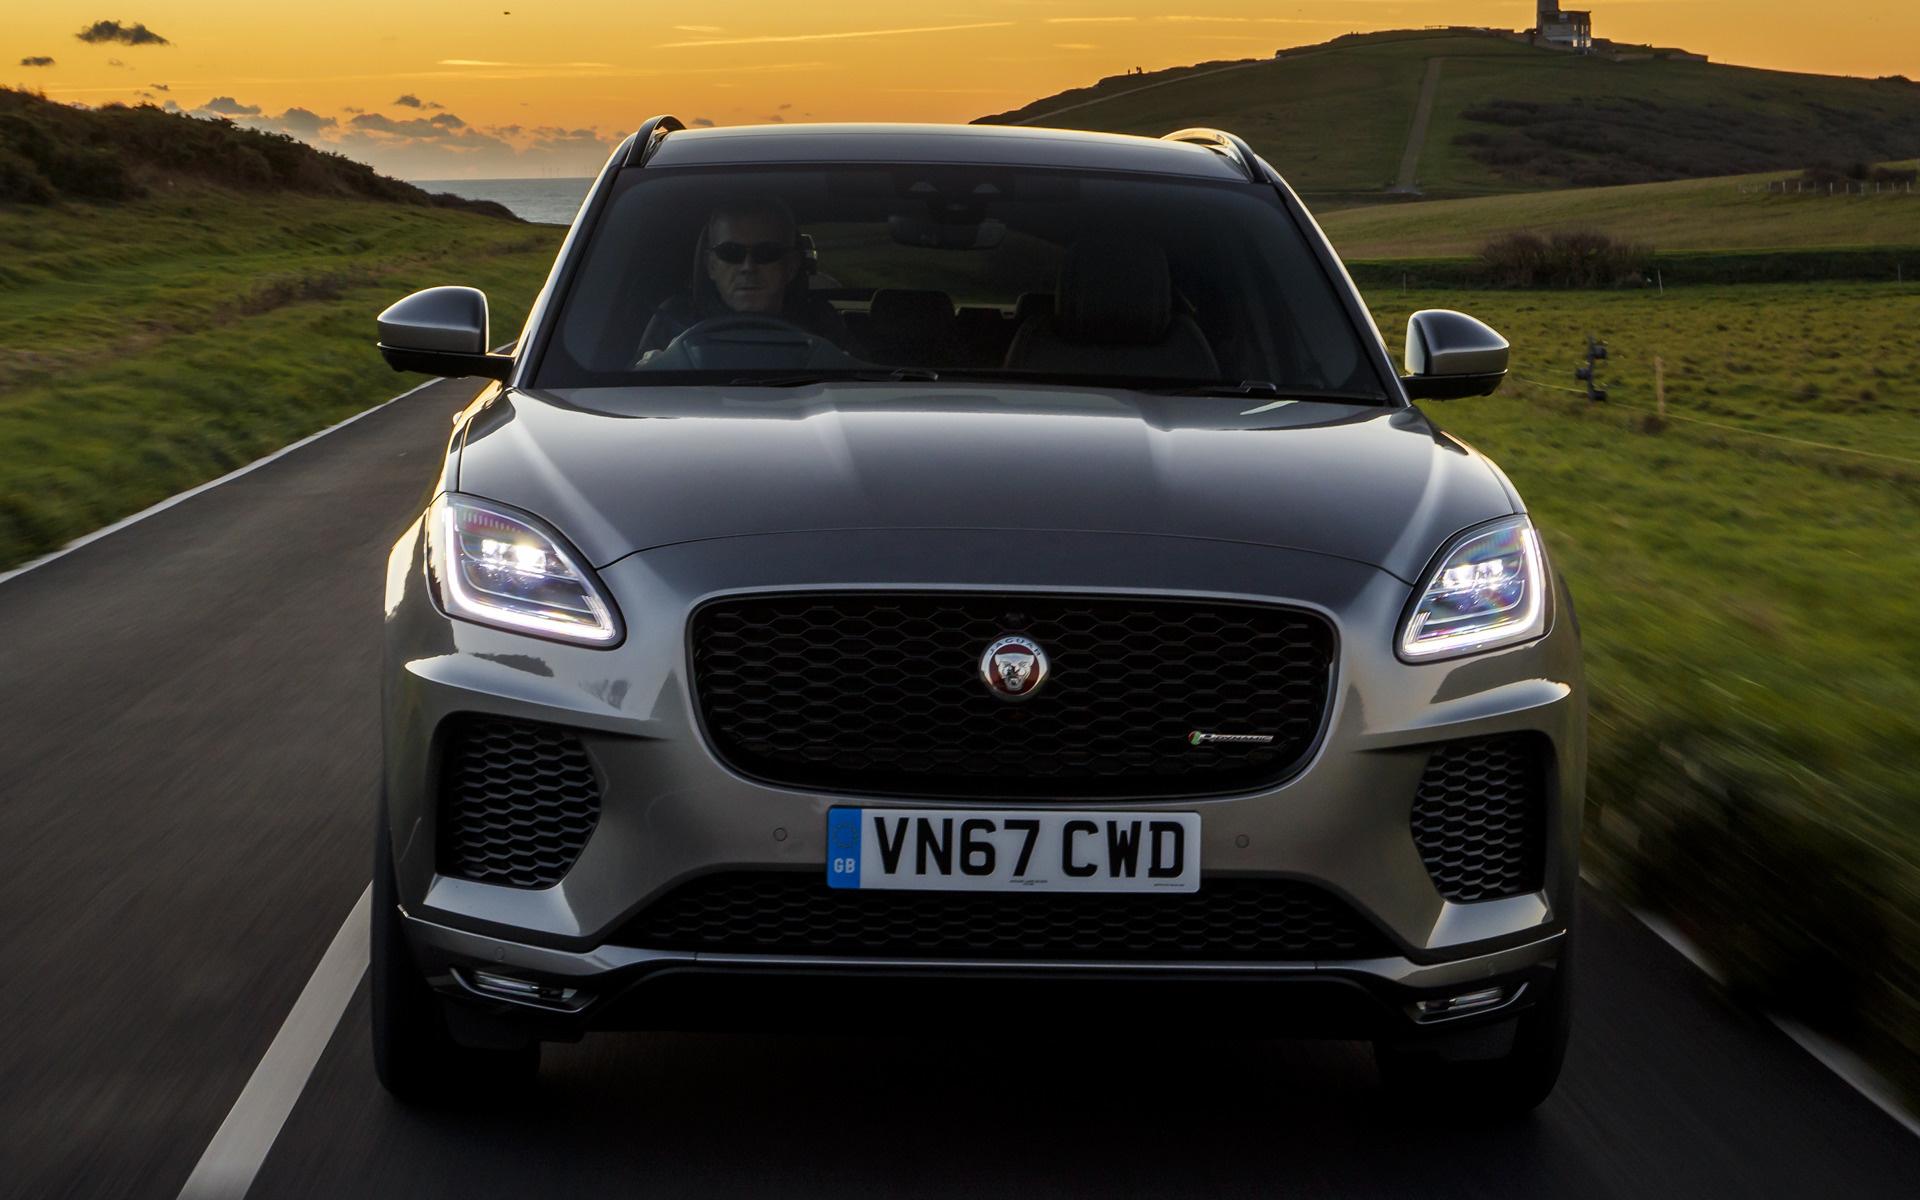 2017 Jaguar E-Pace R-Dynamic (UK) - Wallpapers and HD Images | Car Pixel